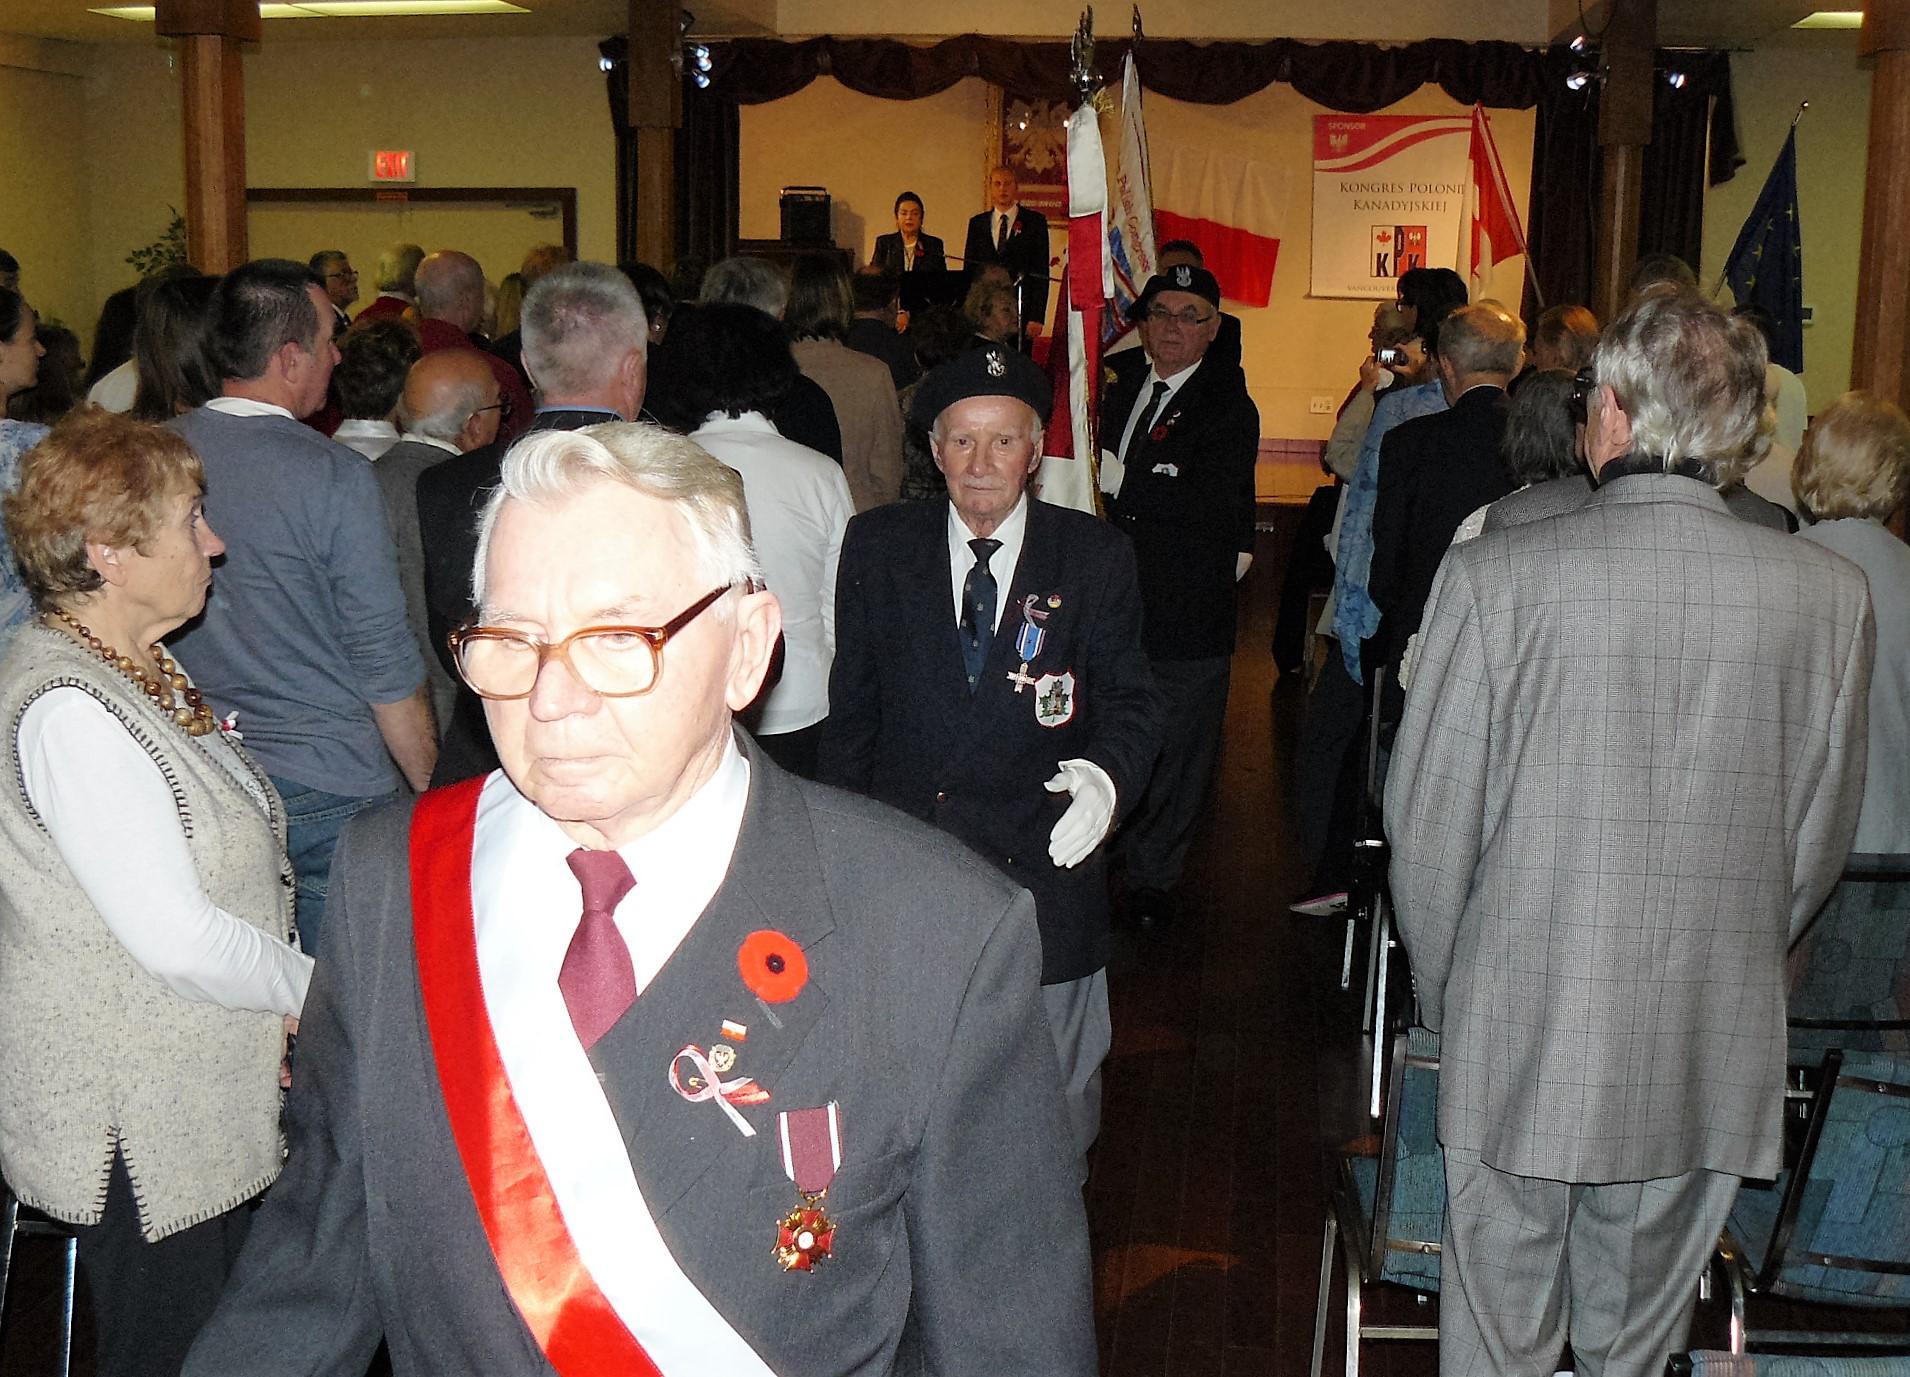 S. Jaworski, Flag Marshal